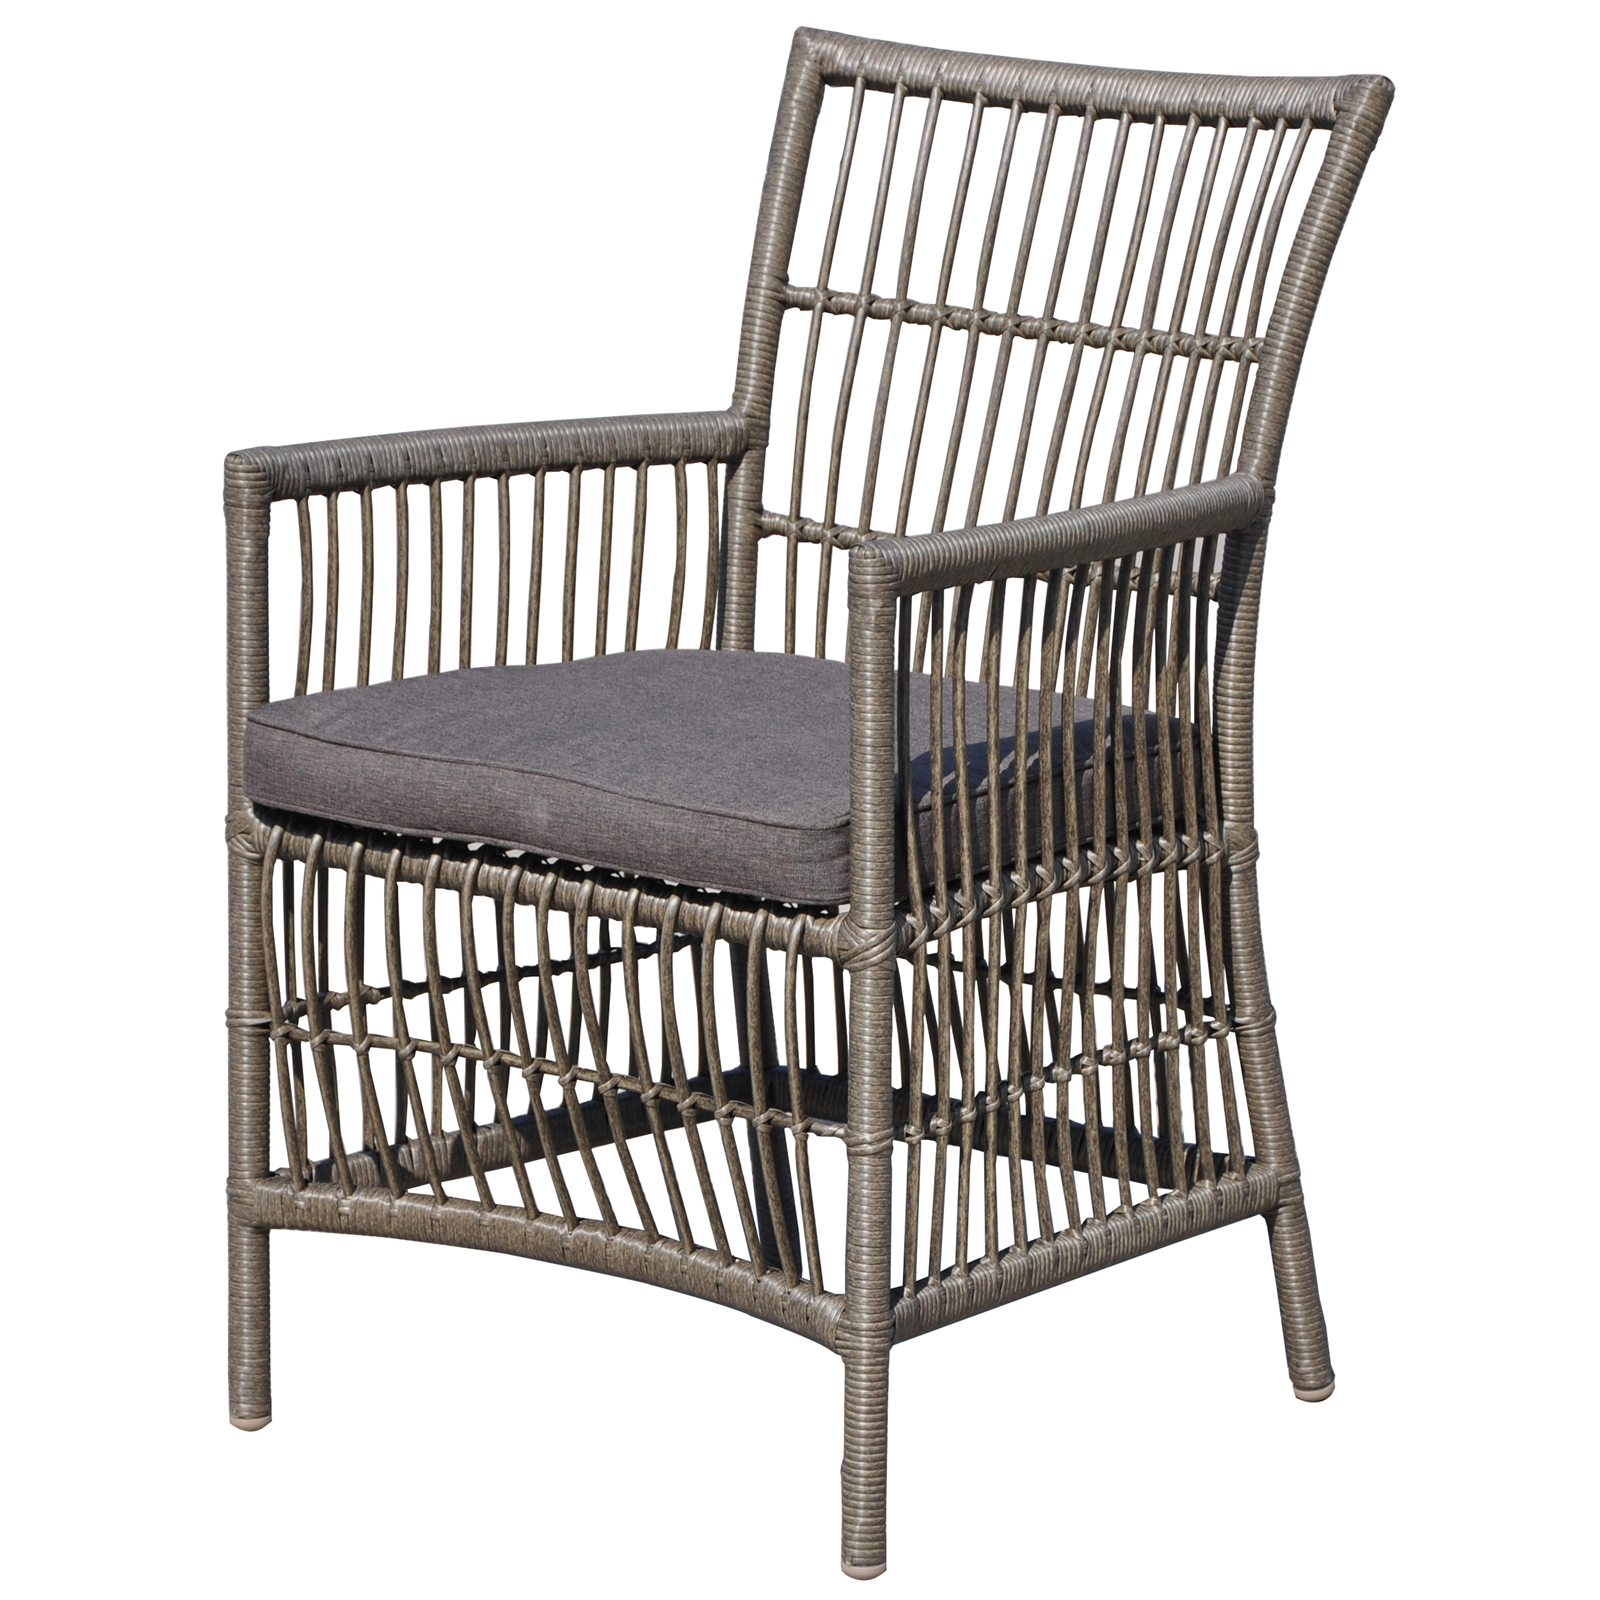 Mimosa Waiheke Resin Wicker Chair Bunnings Warehouse